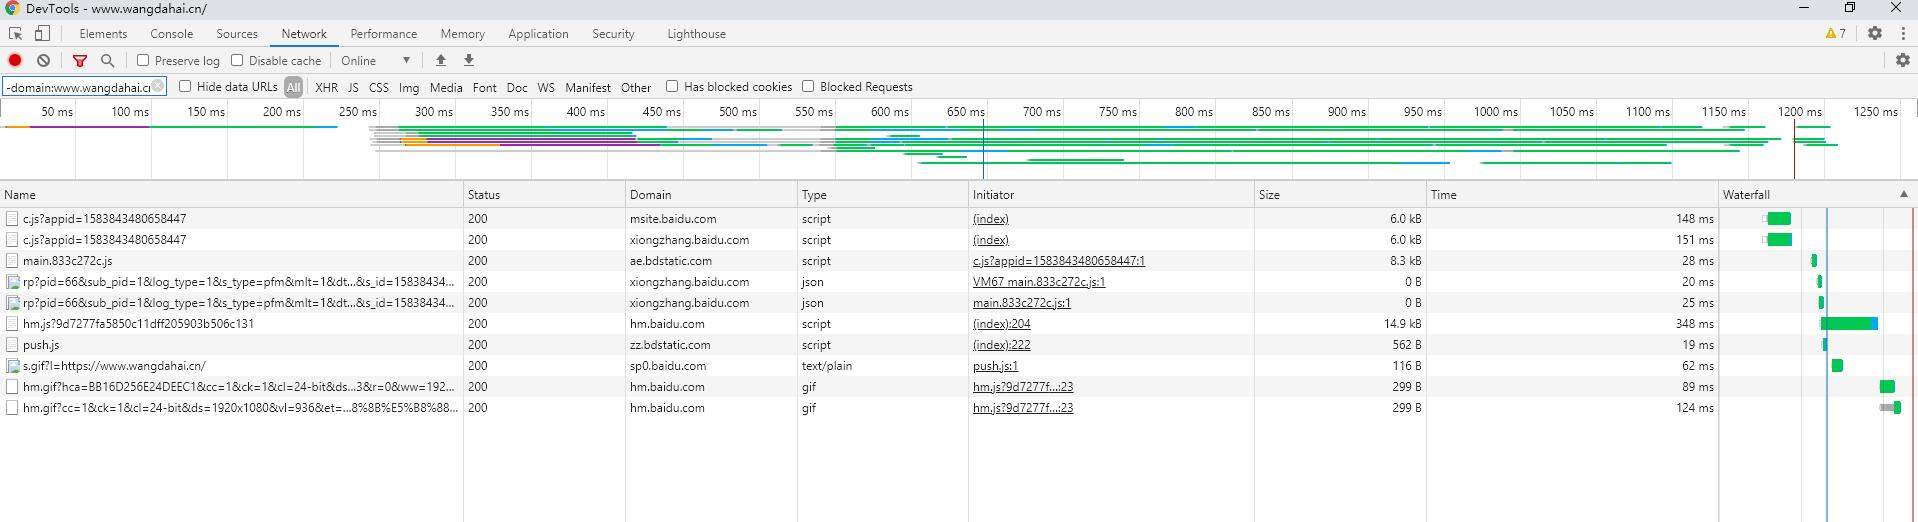 DevTools 请求数据之高级筛选 -3